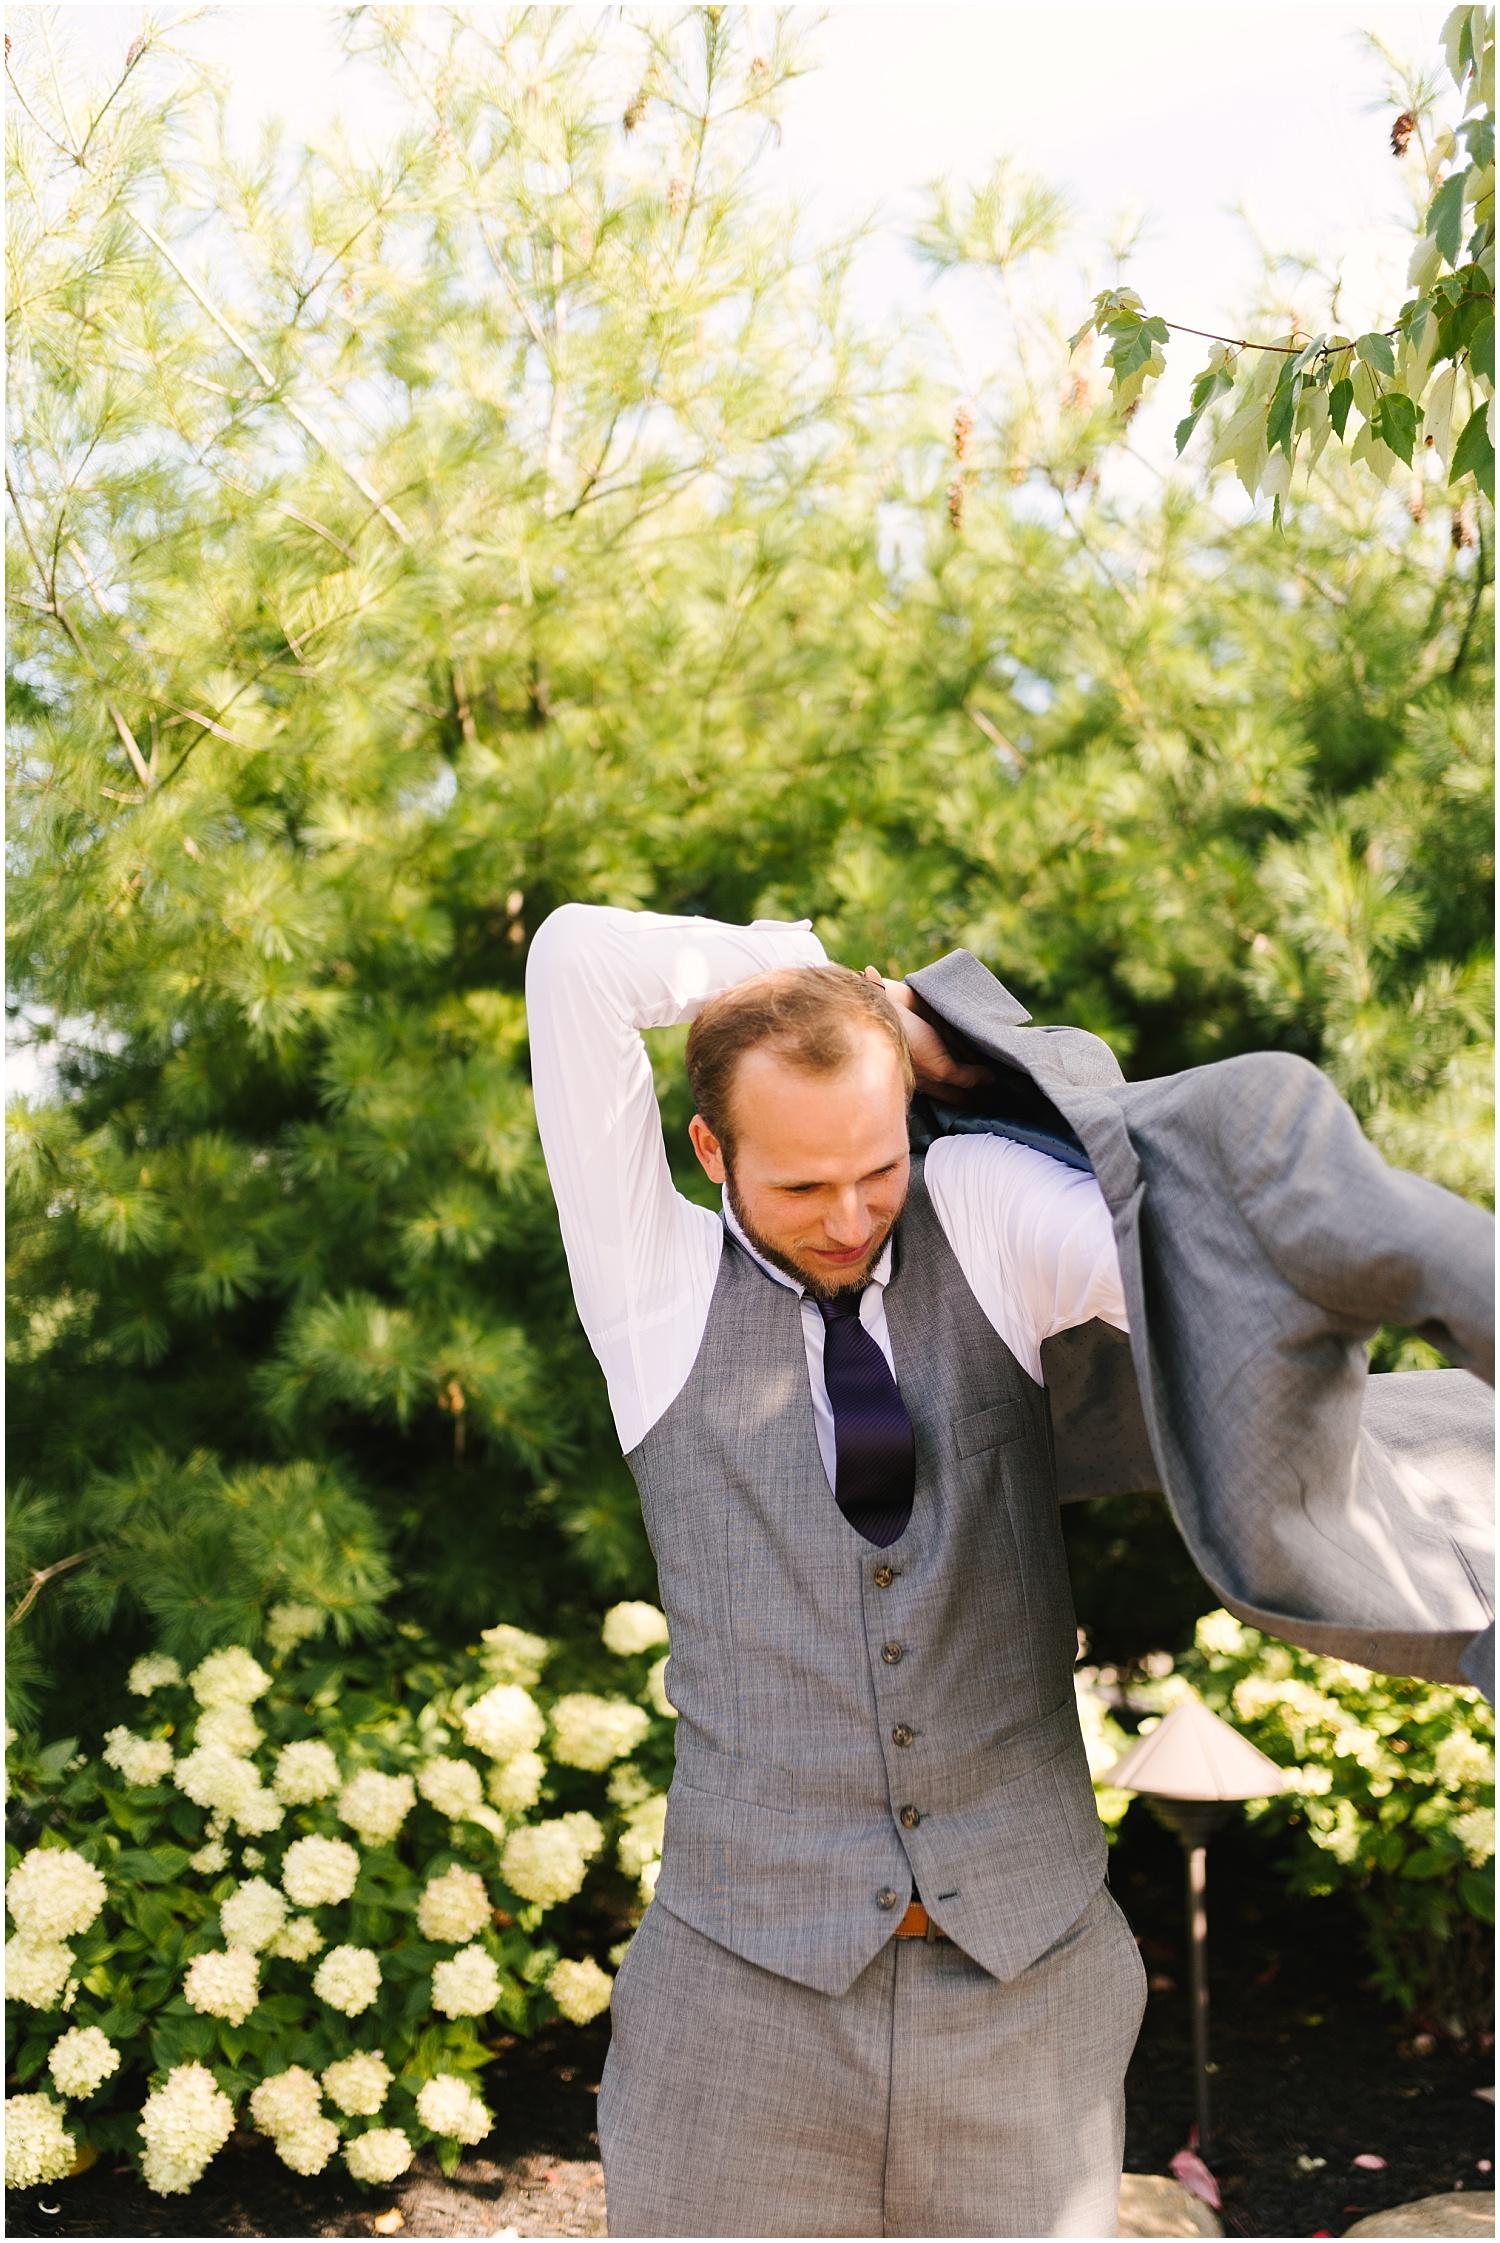 deerfield+country+club+wedding+rochester+NY+photographer (8).jpg